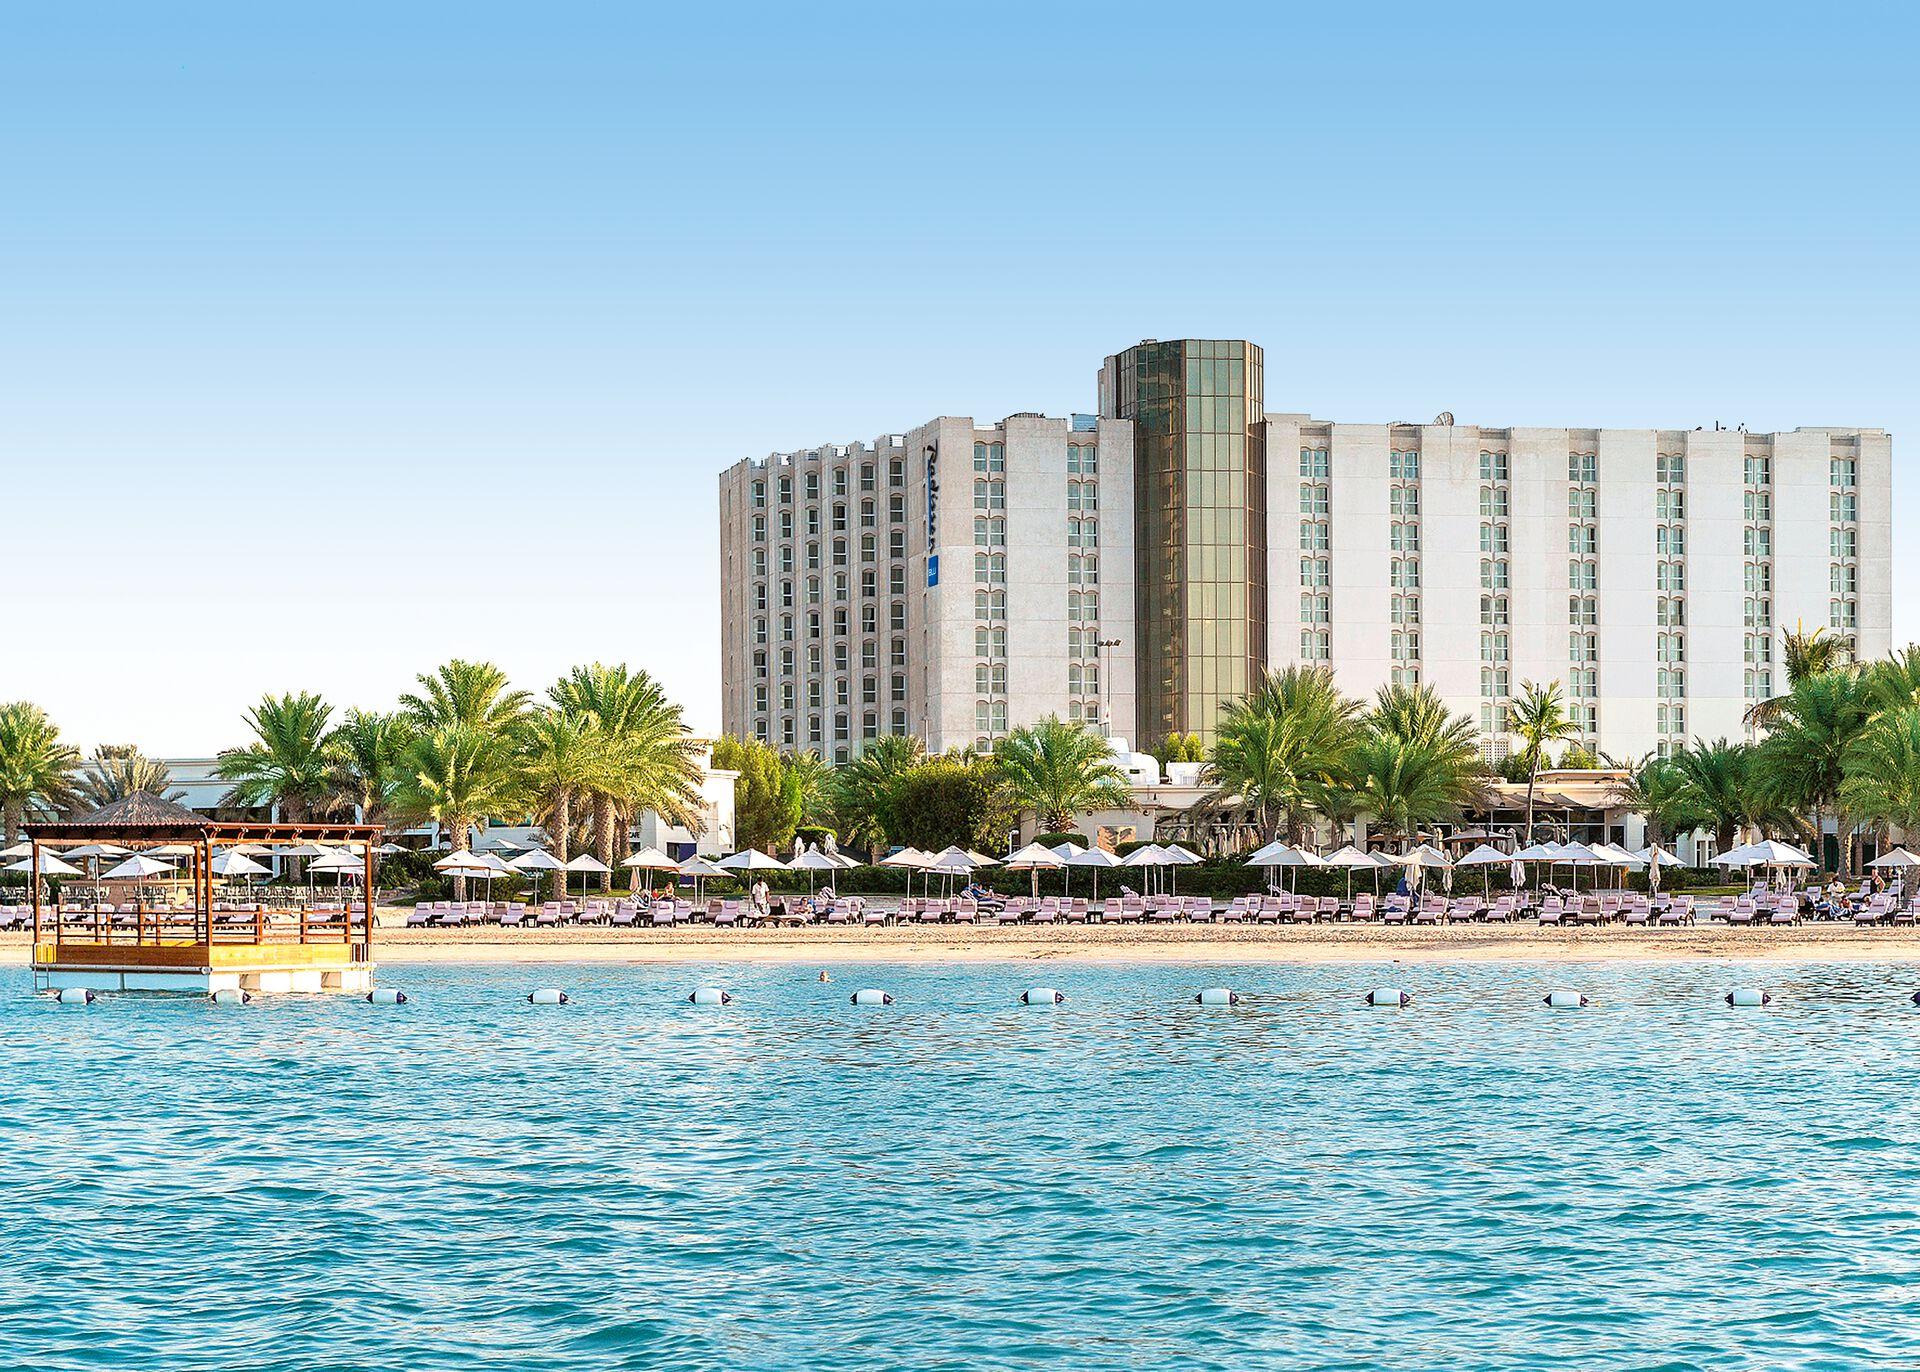 Séjour Abu Dhabi - Radisson Blu Hotel & Resort Abu Dhabi Corniche - 5*